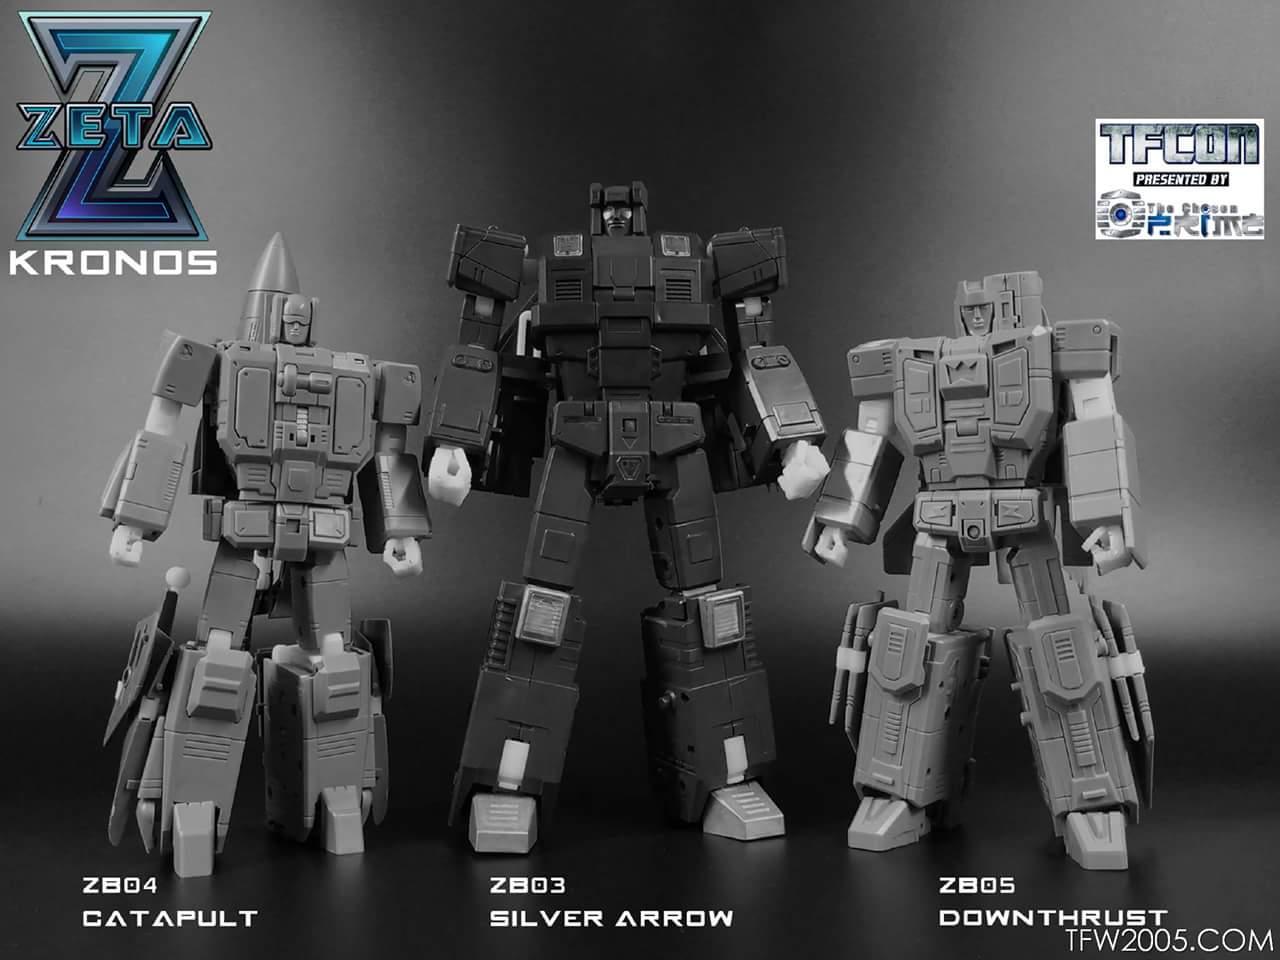 [Zeta Toys] Produit Tiers ― Kronos (ZB-01 à ZB-05) ― ZB-06|ZB-07 Superitron ― aka Superion - Page 2 7mMTIwKp_o